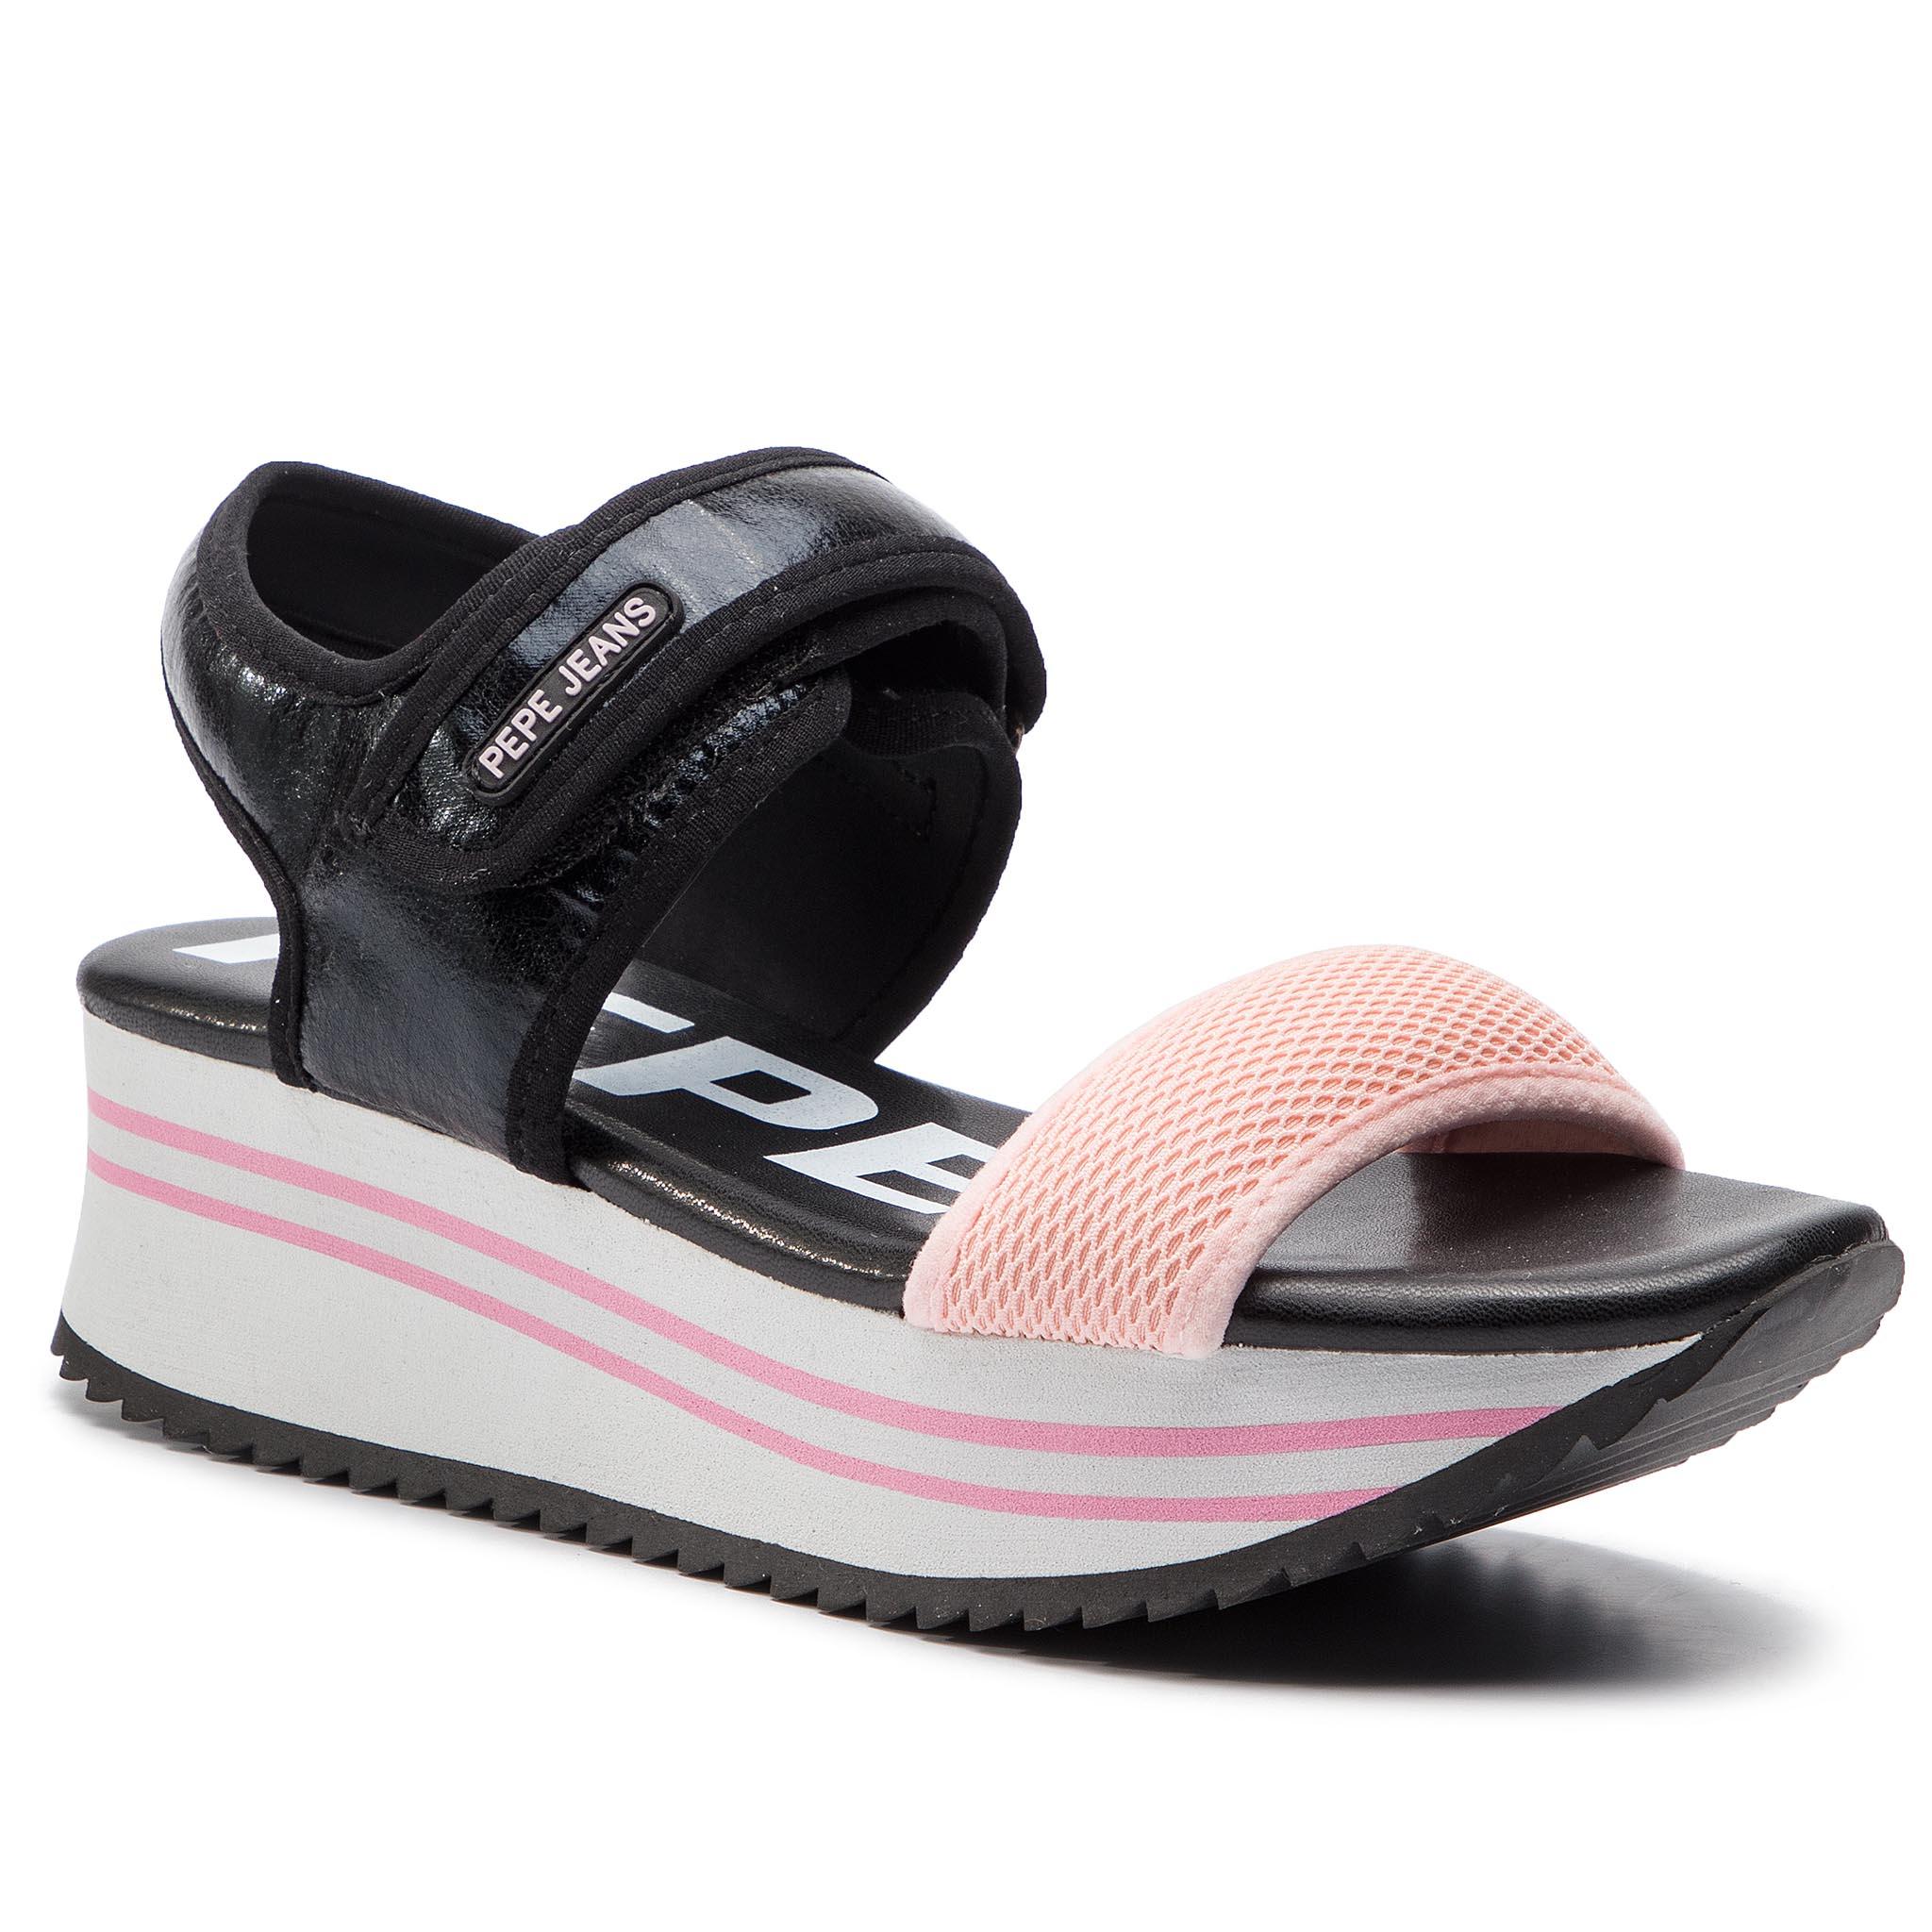 Fuji Mania Sandals Jeans Mules Black Qtdsrcxbh 999 Pls90394 Wedges Pepe Yfgb6v7y